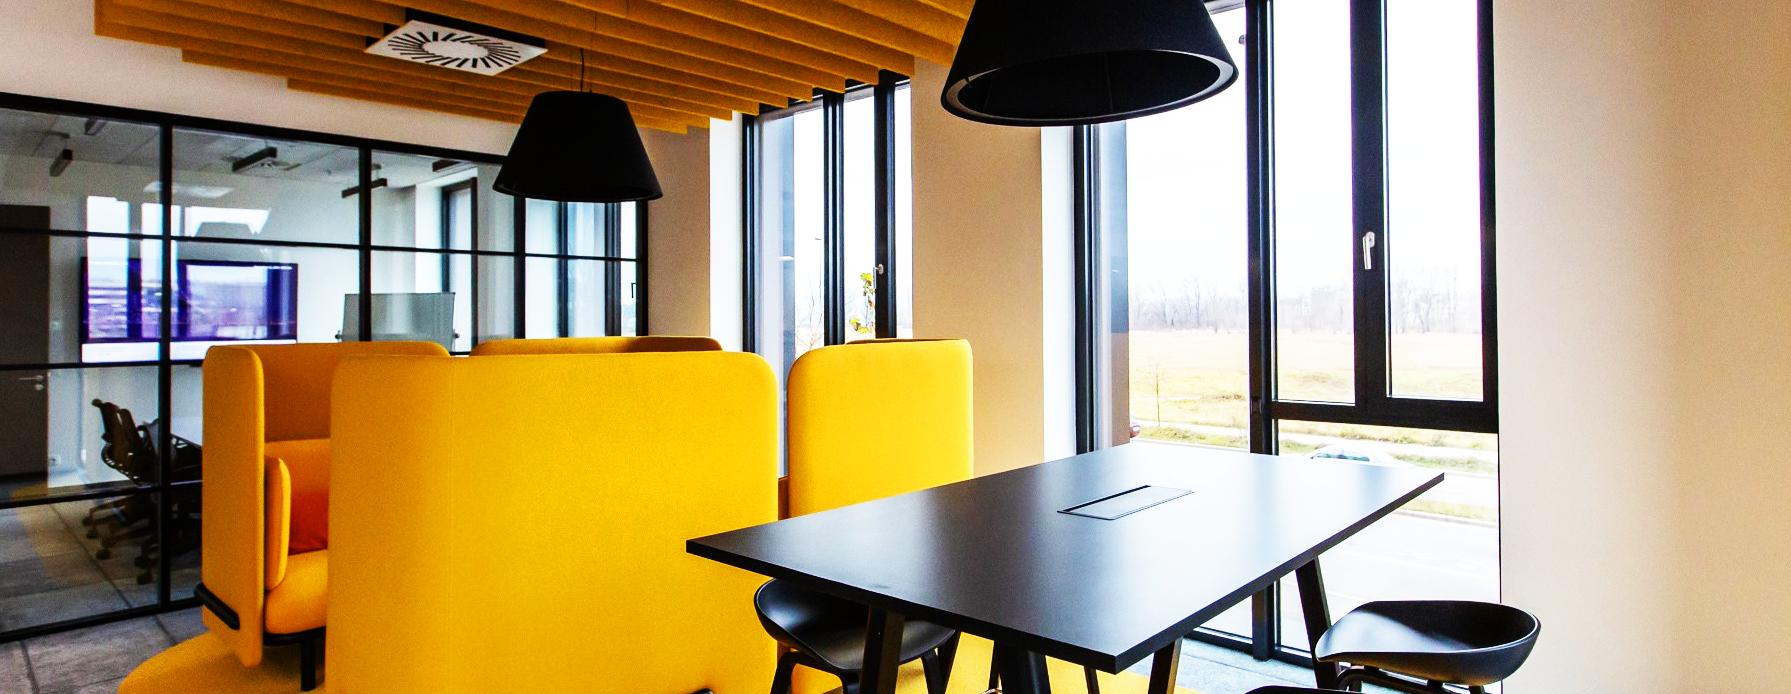 Collaborative environment of Citrix Prague office